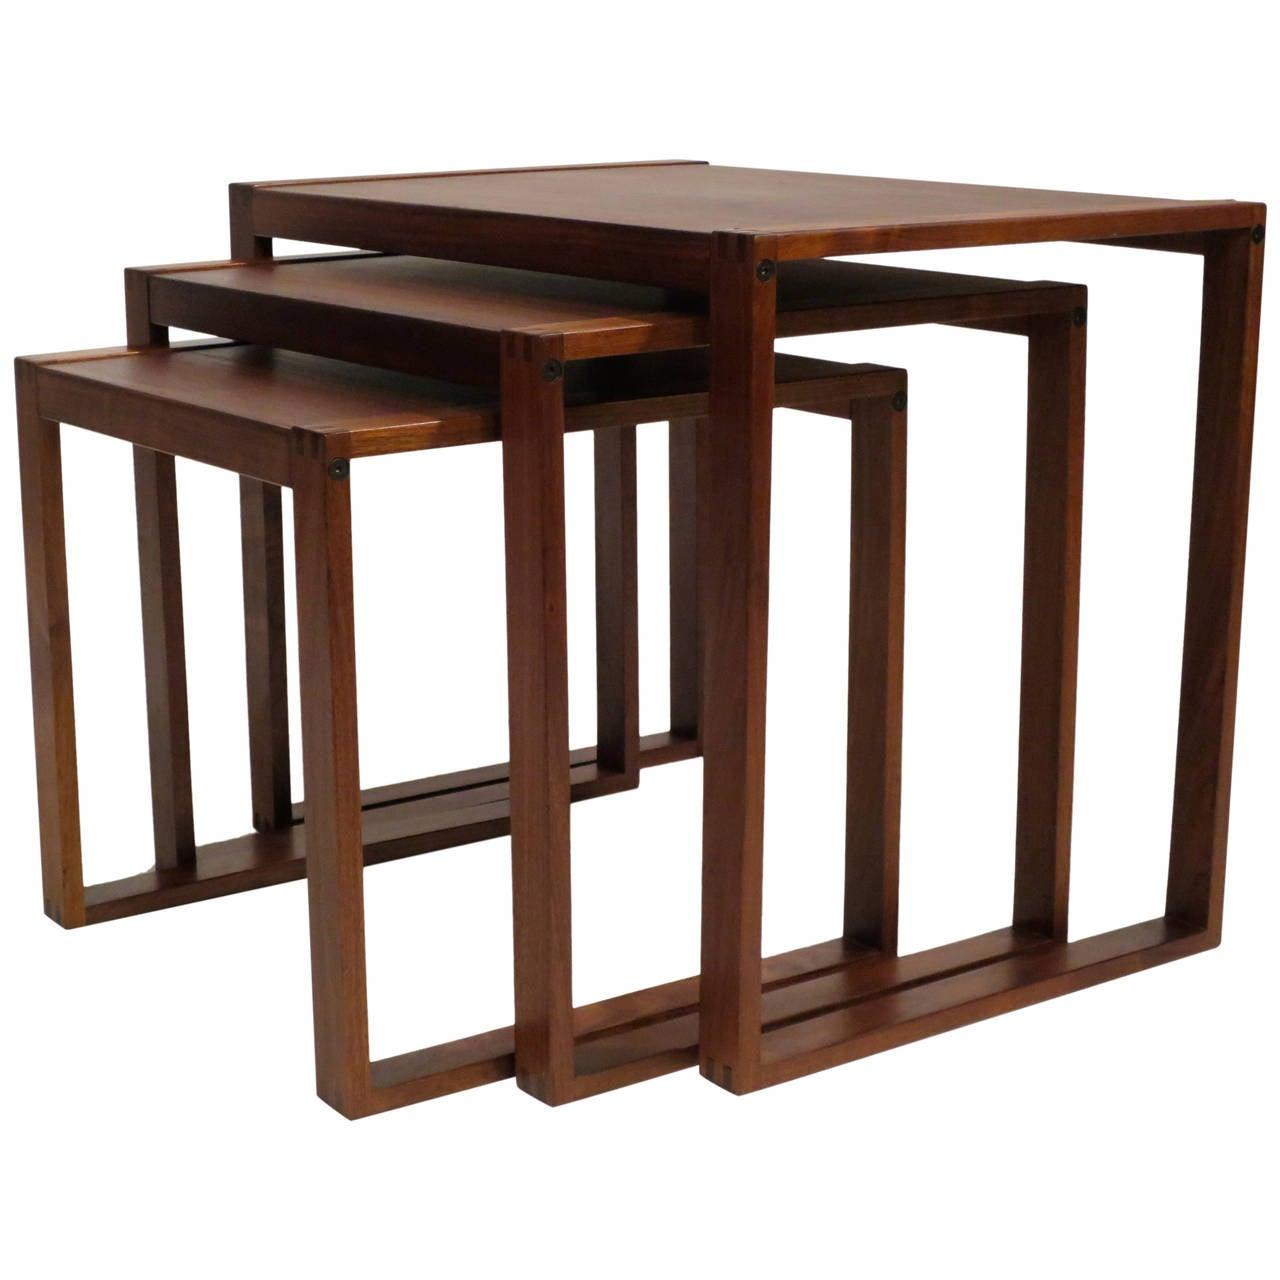 Contemporary Nesting Tables ~ Set of danish modern walnut nesting tables at stdibs